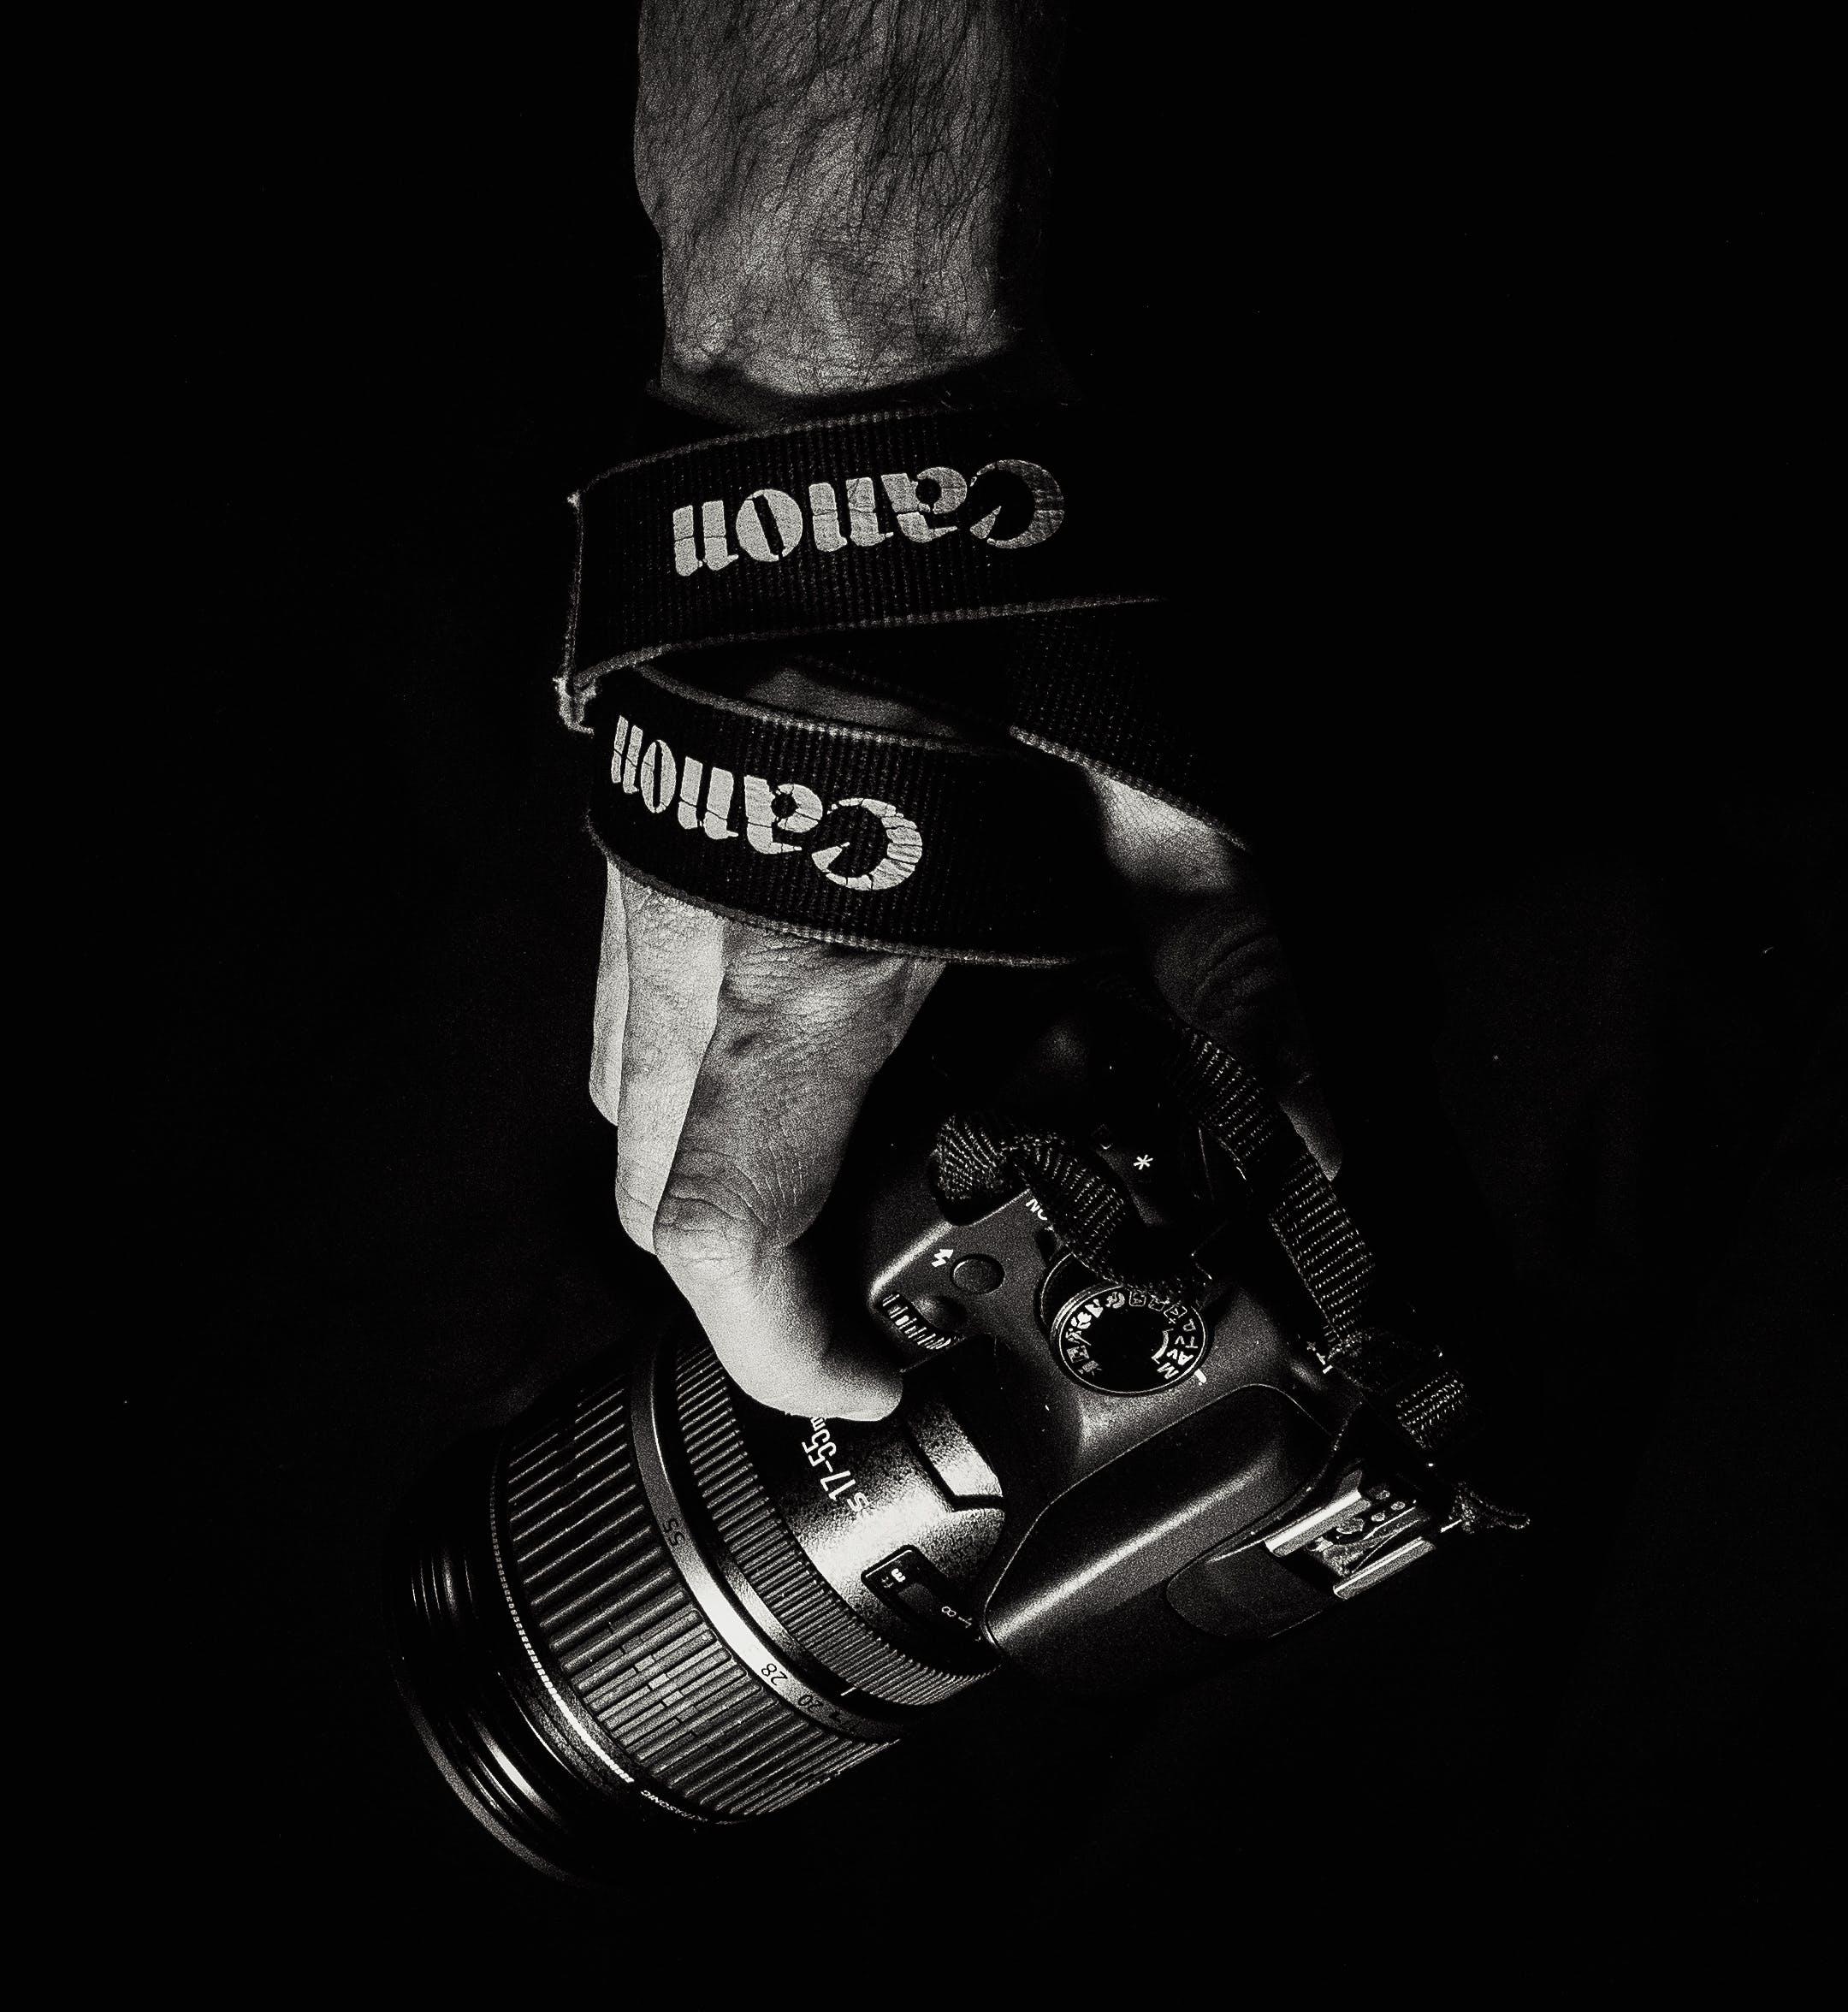 Free stock photo of black, black and white, black&white, camera lens